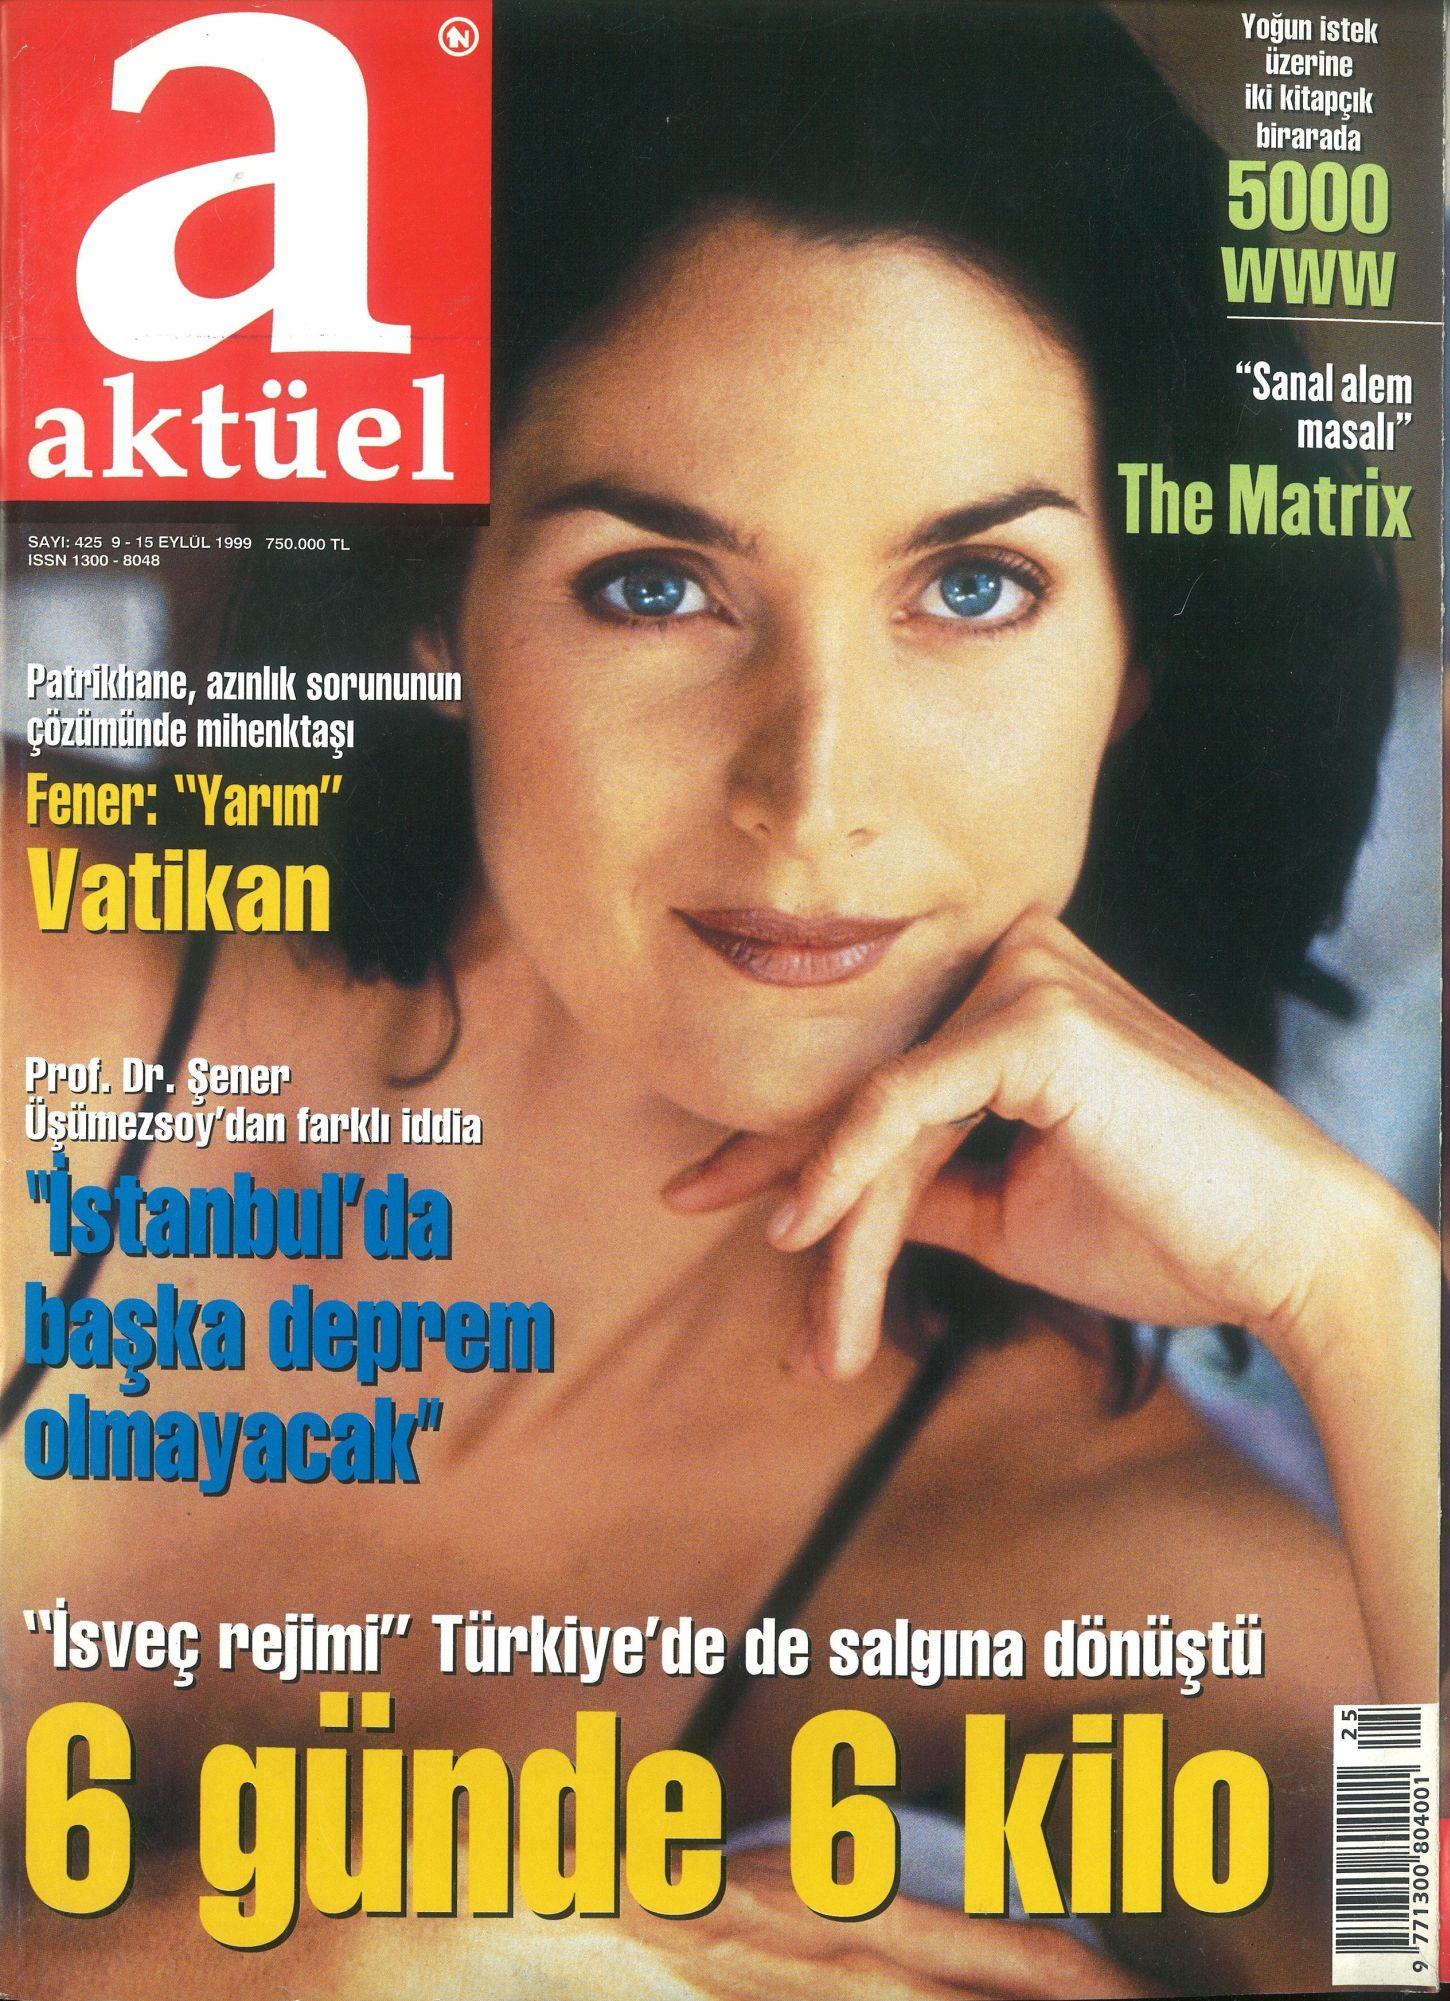 windows-muhendisi-yumurcak-murat-muratoglu-aktuel-dergisi (0)